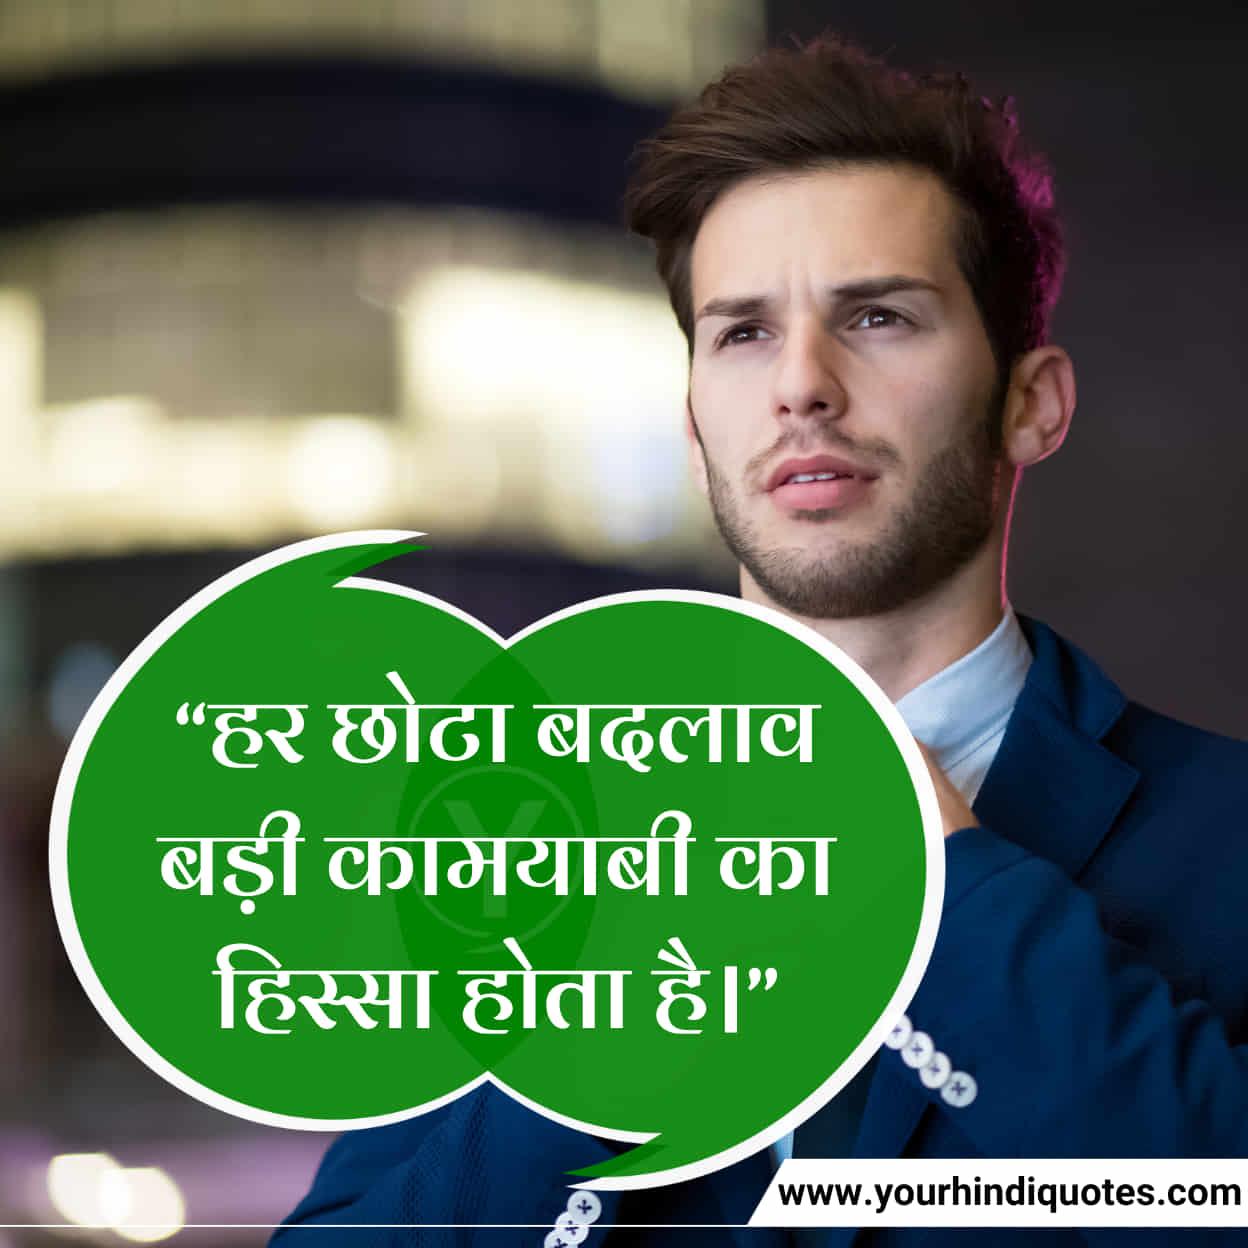 Hindi Motivational Status for Whatsapp